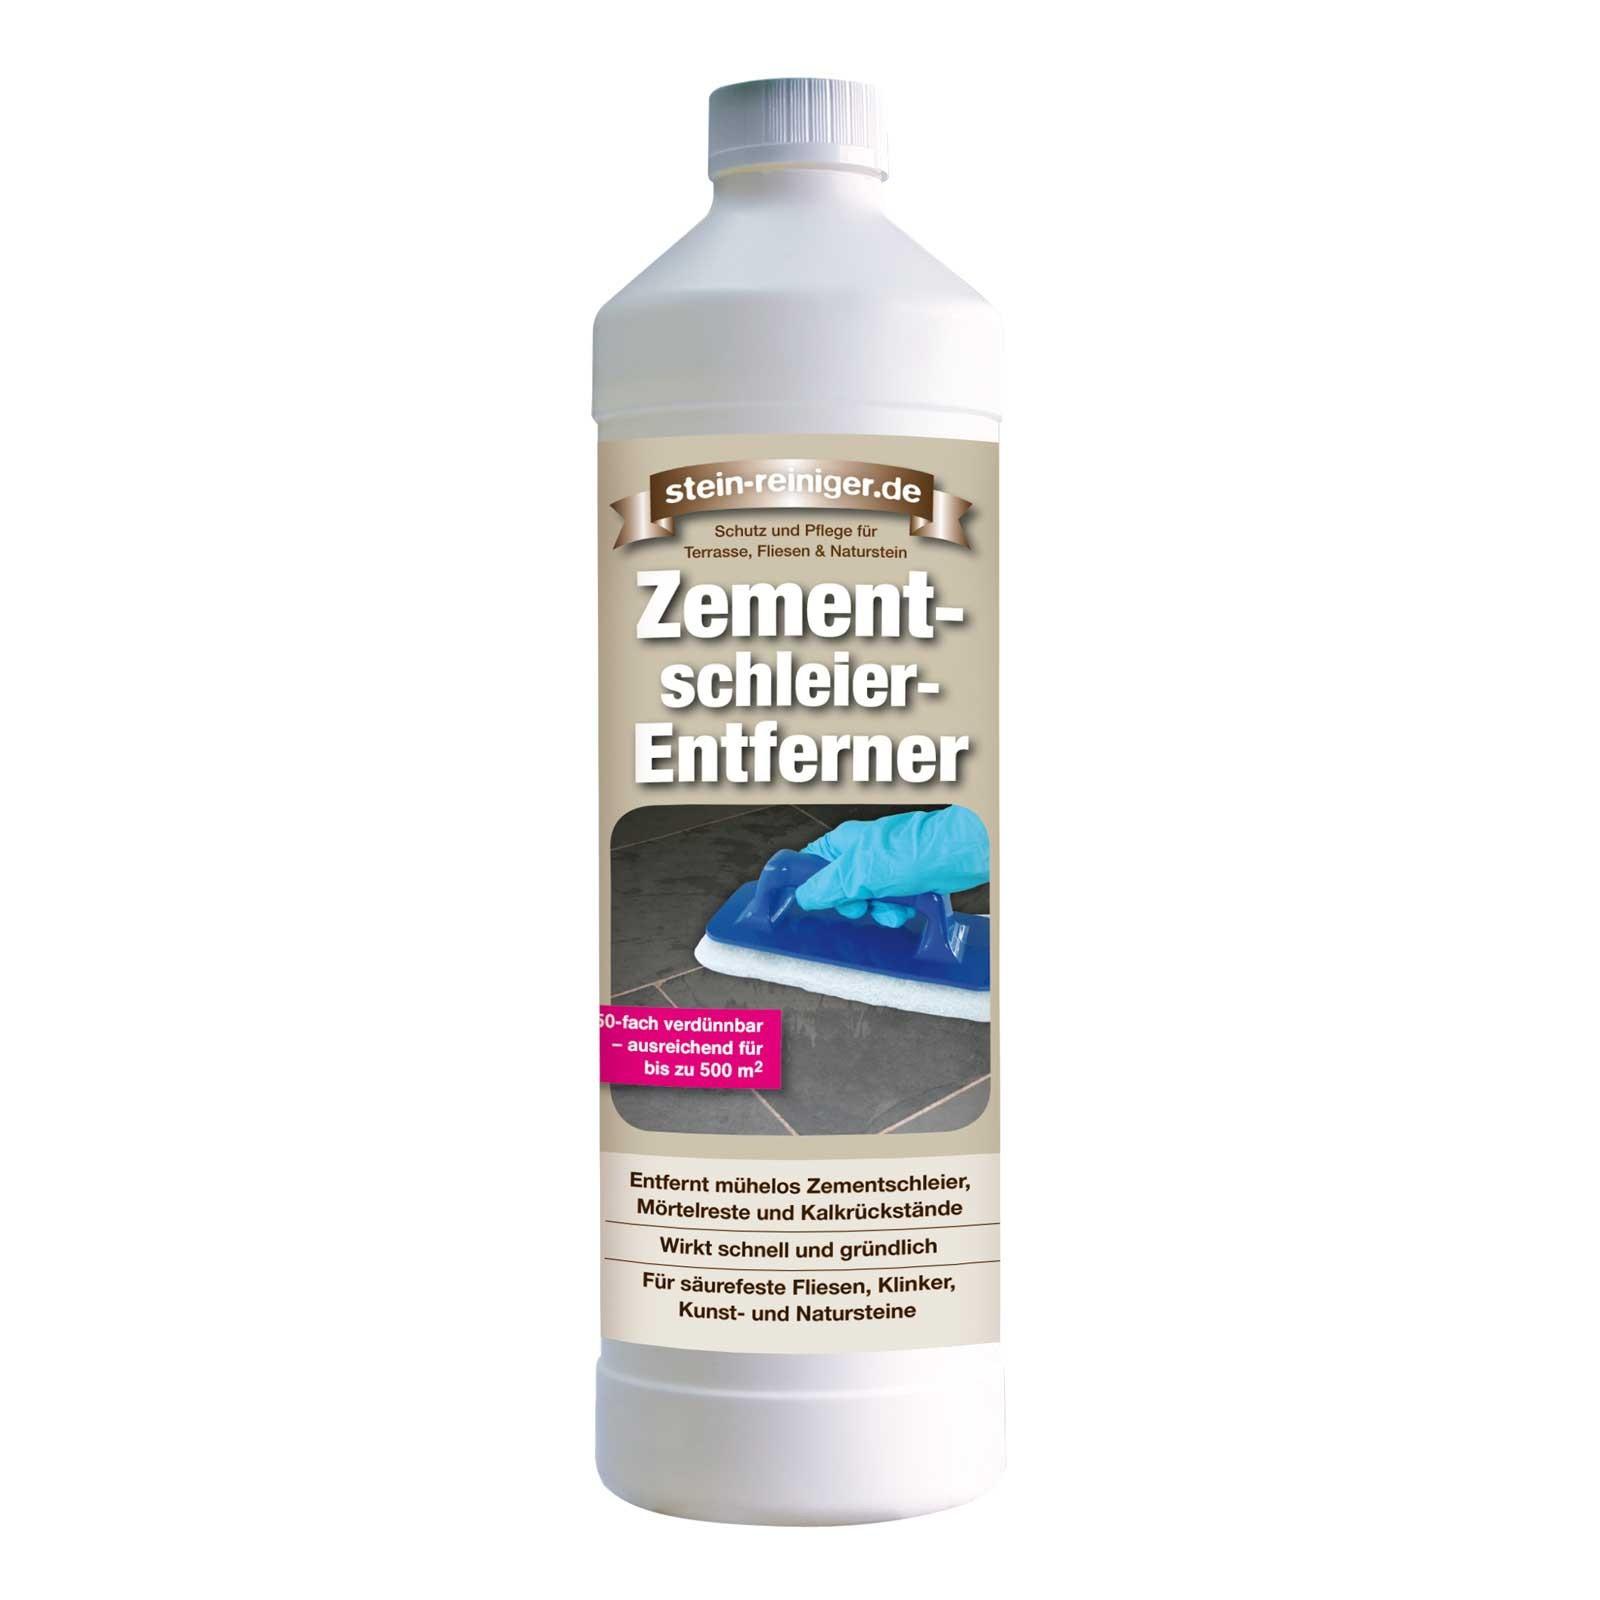 Zementschleier-Entferner Ultra-Konzentrat 1L Reinigen ...